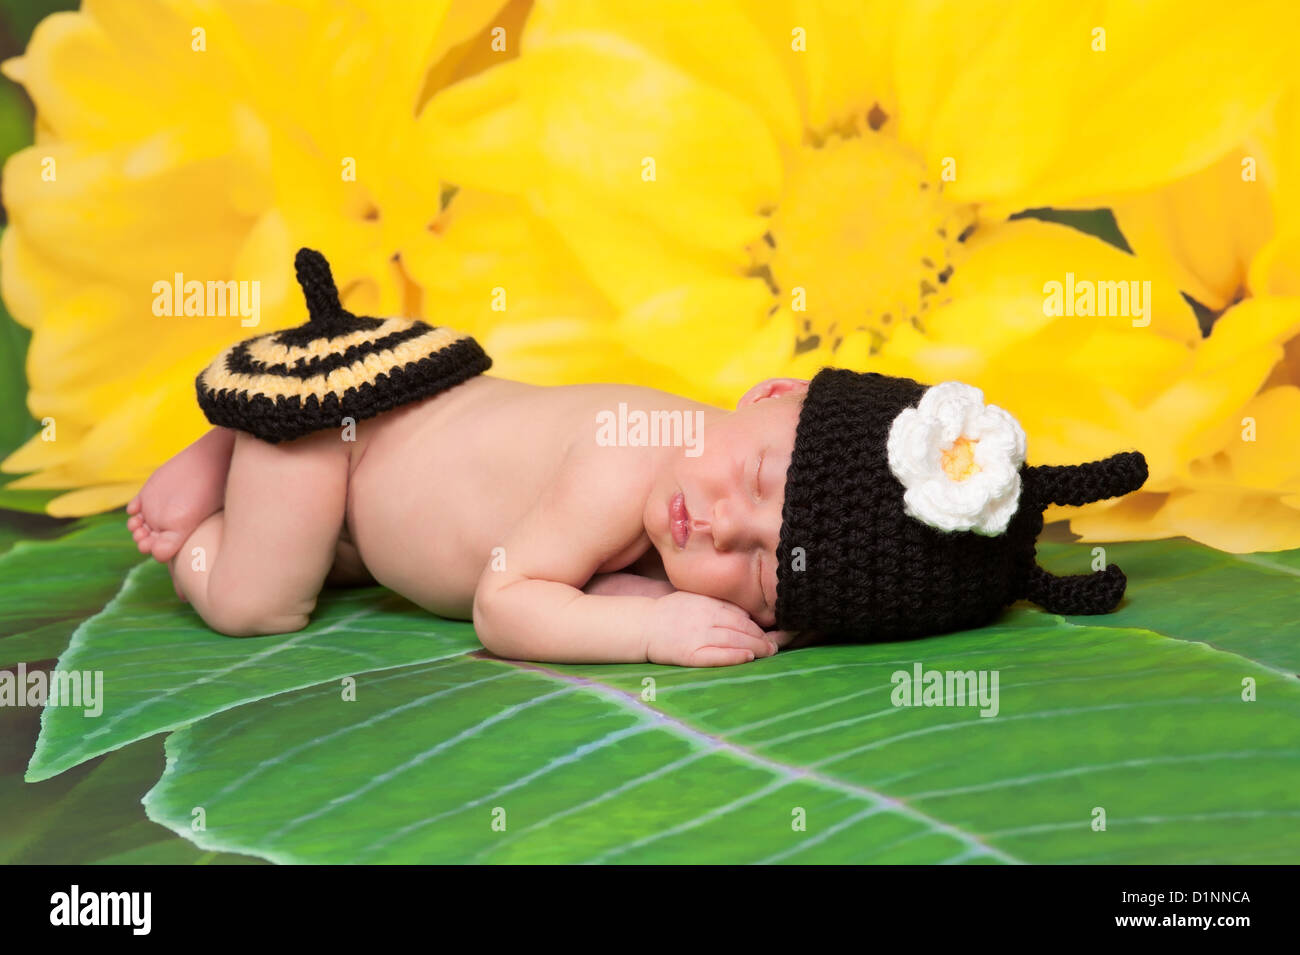 7721c387518 newborn baby girl wearing a black and yellow crocheted bumblebee costume -  Stock Image